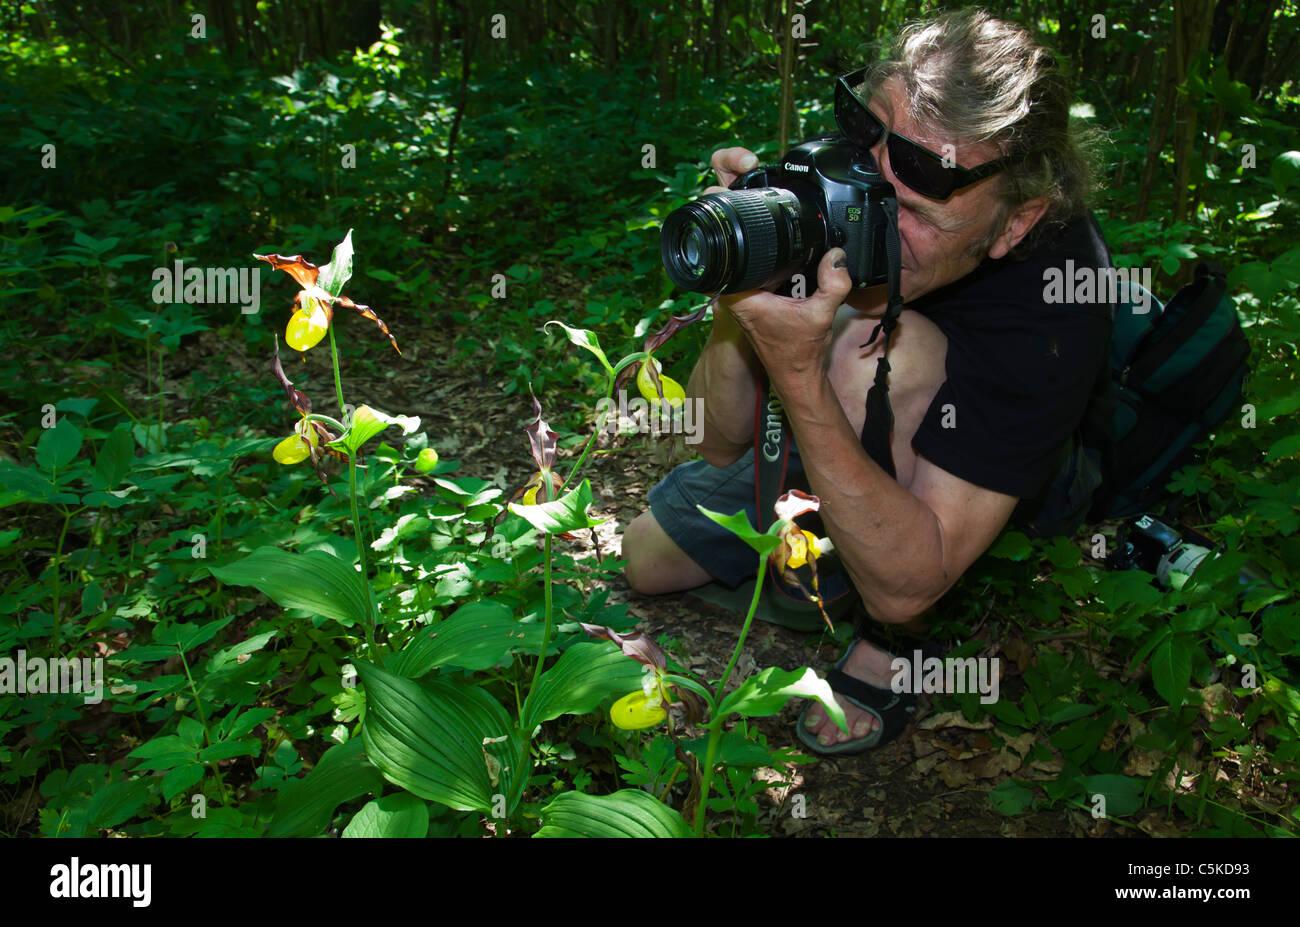 Fotografie Natur Fotografen fotografieren Dame rutscht Orchideen Schweden Stockbild